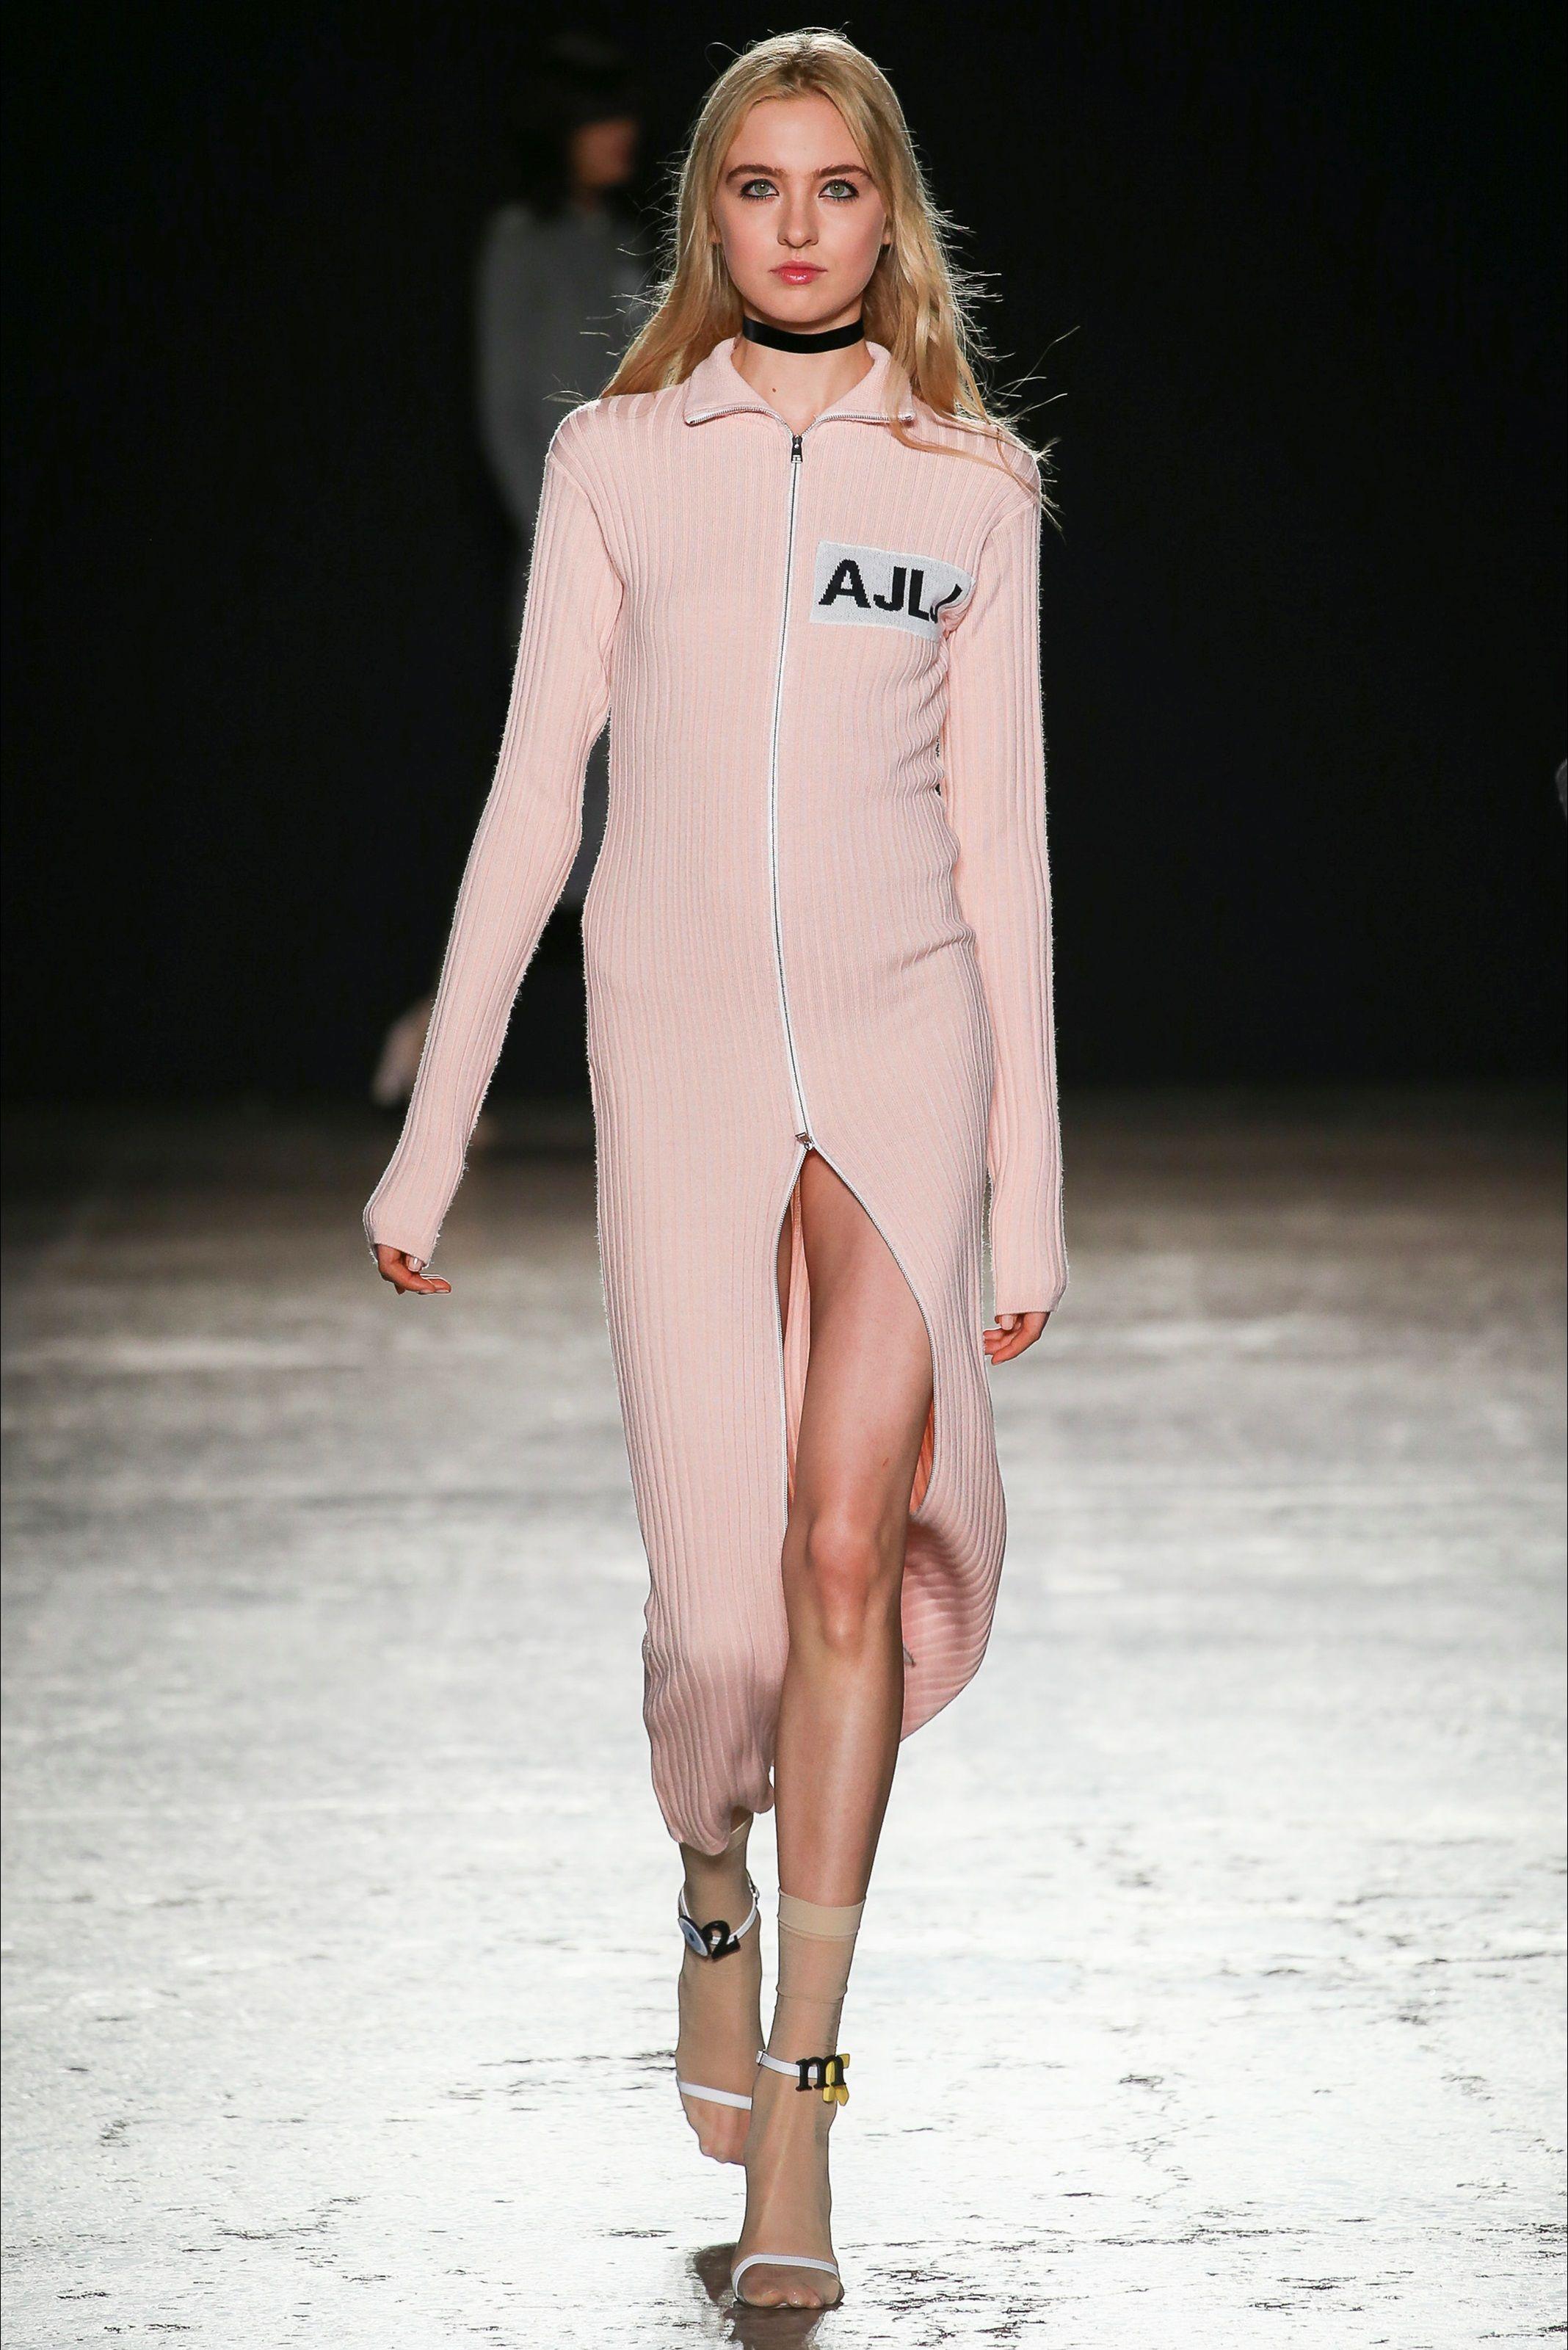 Au Jour Le Jour Spring/Summer 2015 Ready-To-Wear | Fashion